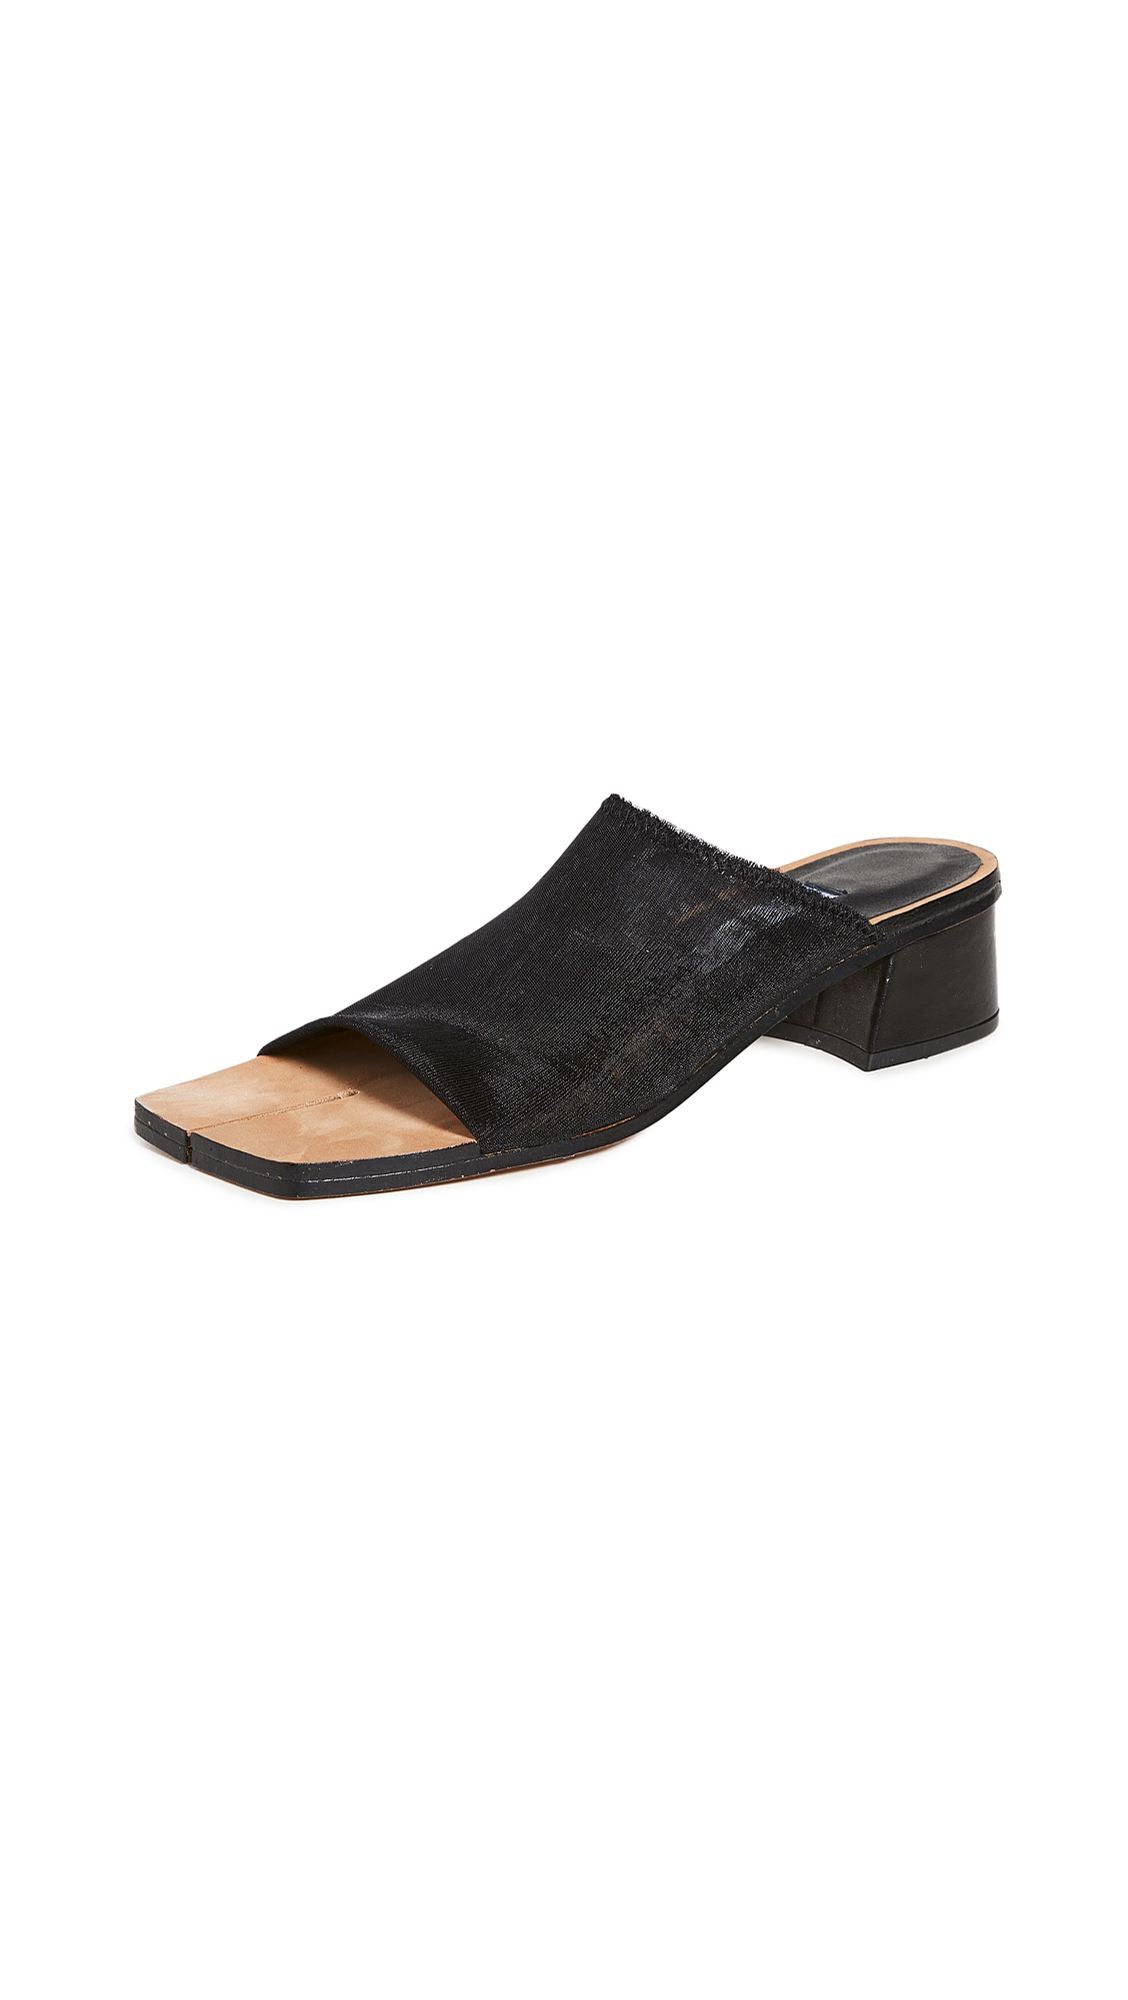 Buy Miista Beck Slides online, shop Miista